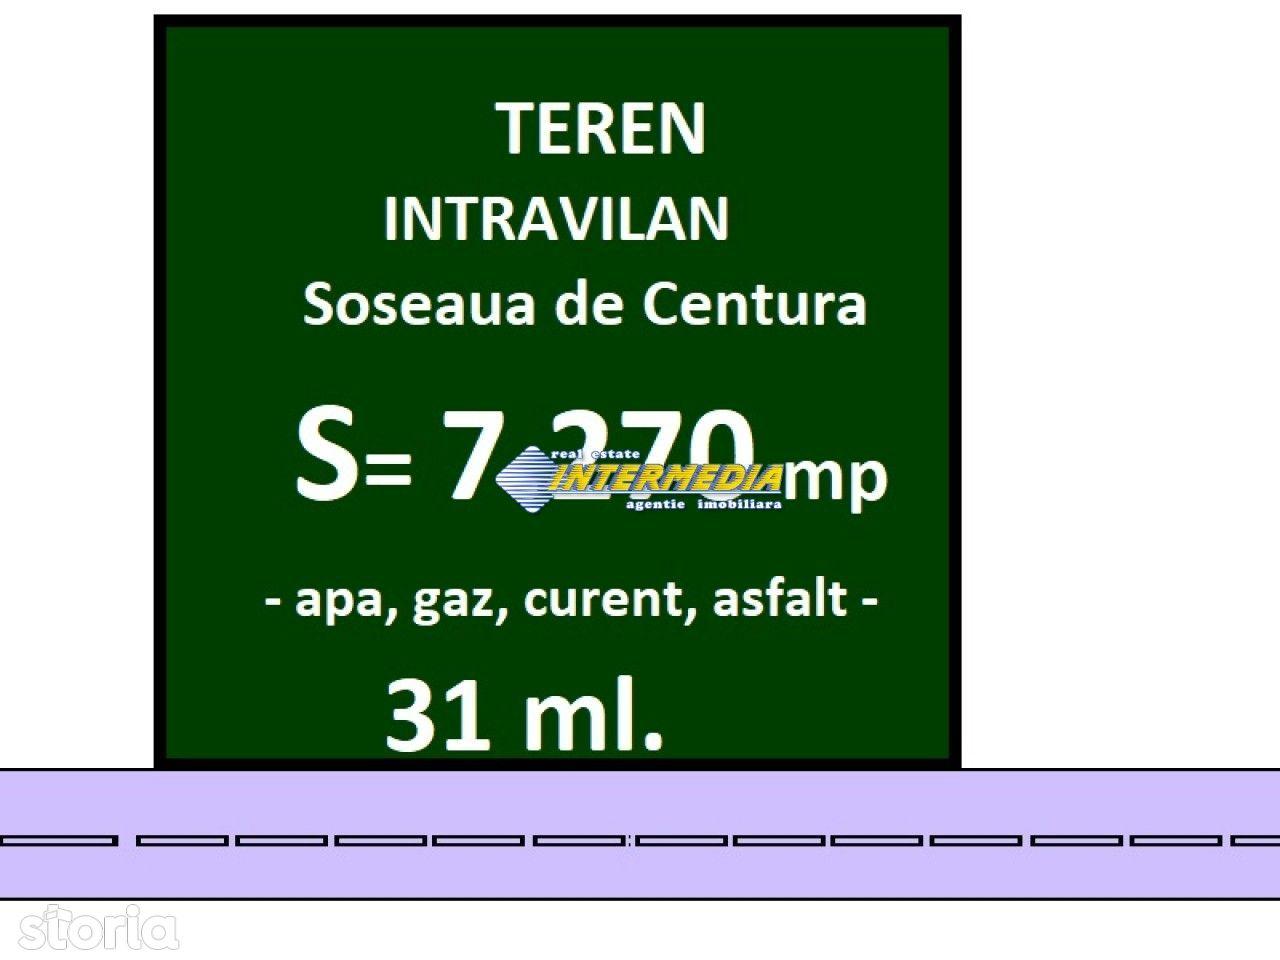 Teren Intravilan Soseaua de Centura Alba Iulia 7270 mp cu deschidere